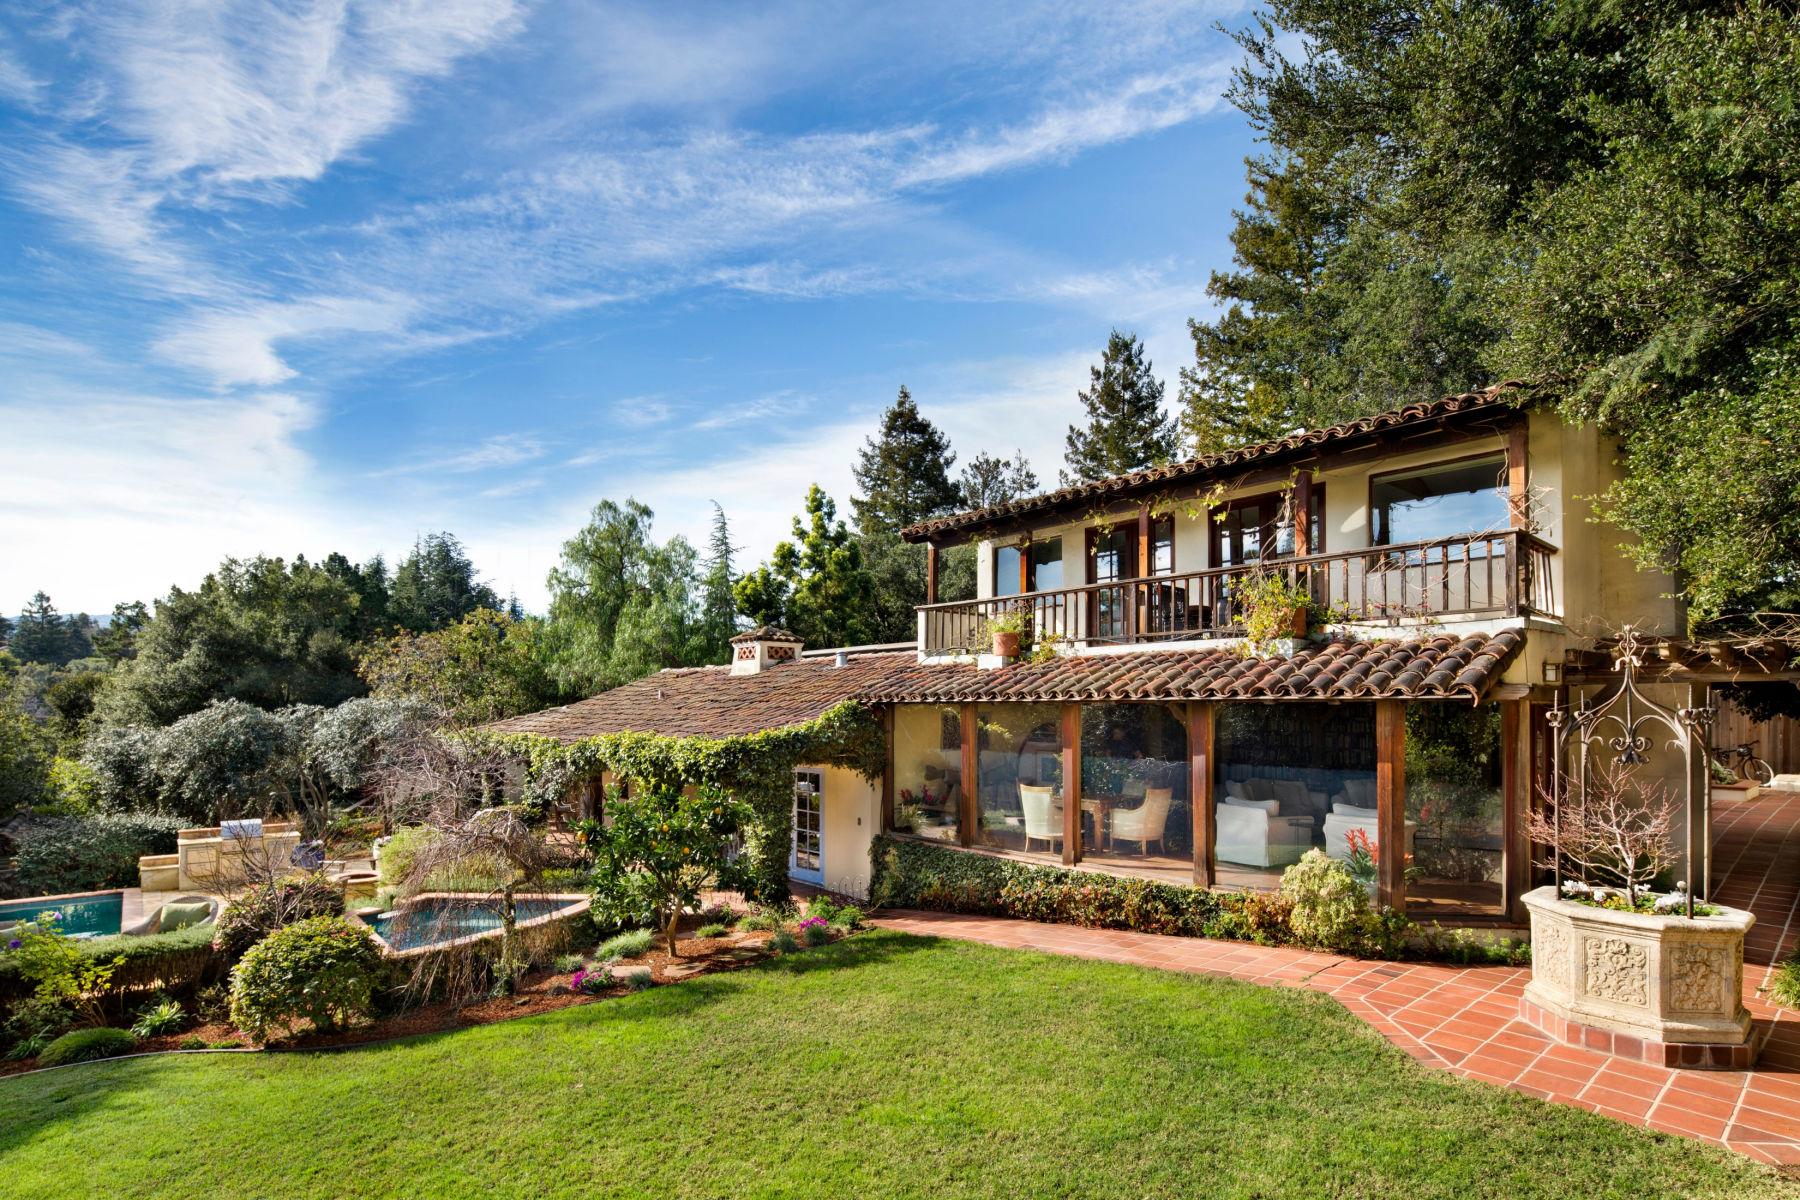 Single Family Home for Sale at Private Los Altos Hills Retreat 14700 Manuella Rd Los Altos Hills, California 94022 United States